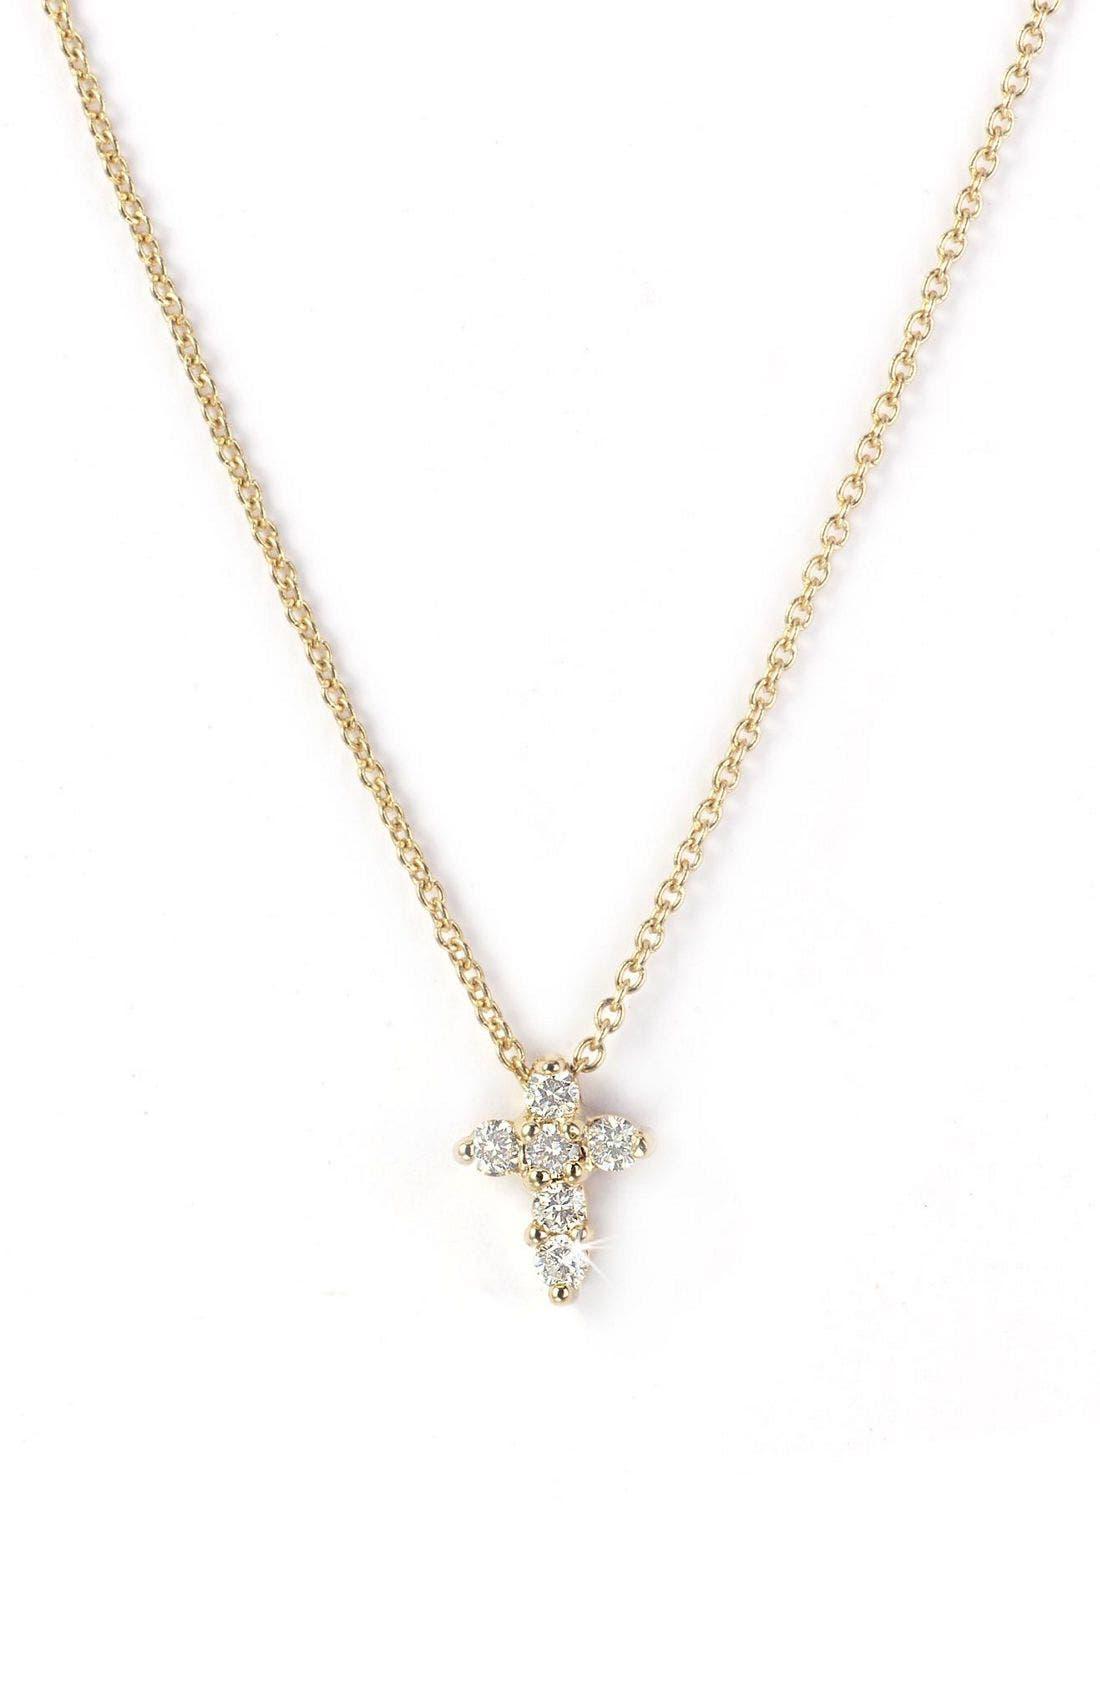 Main Image - Roberto Coin 'Tiny Treasures' Diamond Cross Pendant Necklace